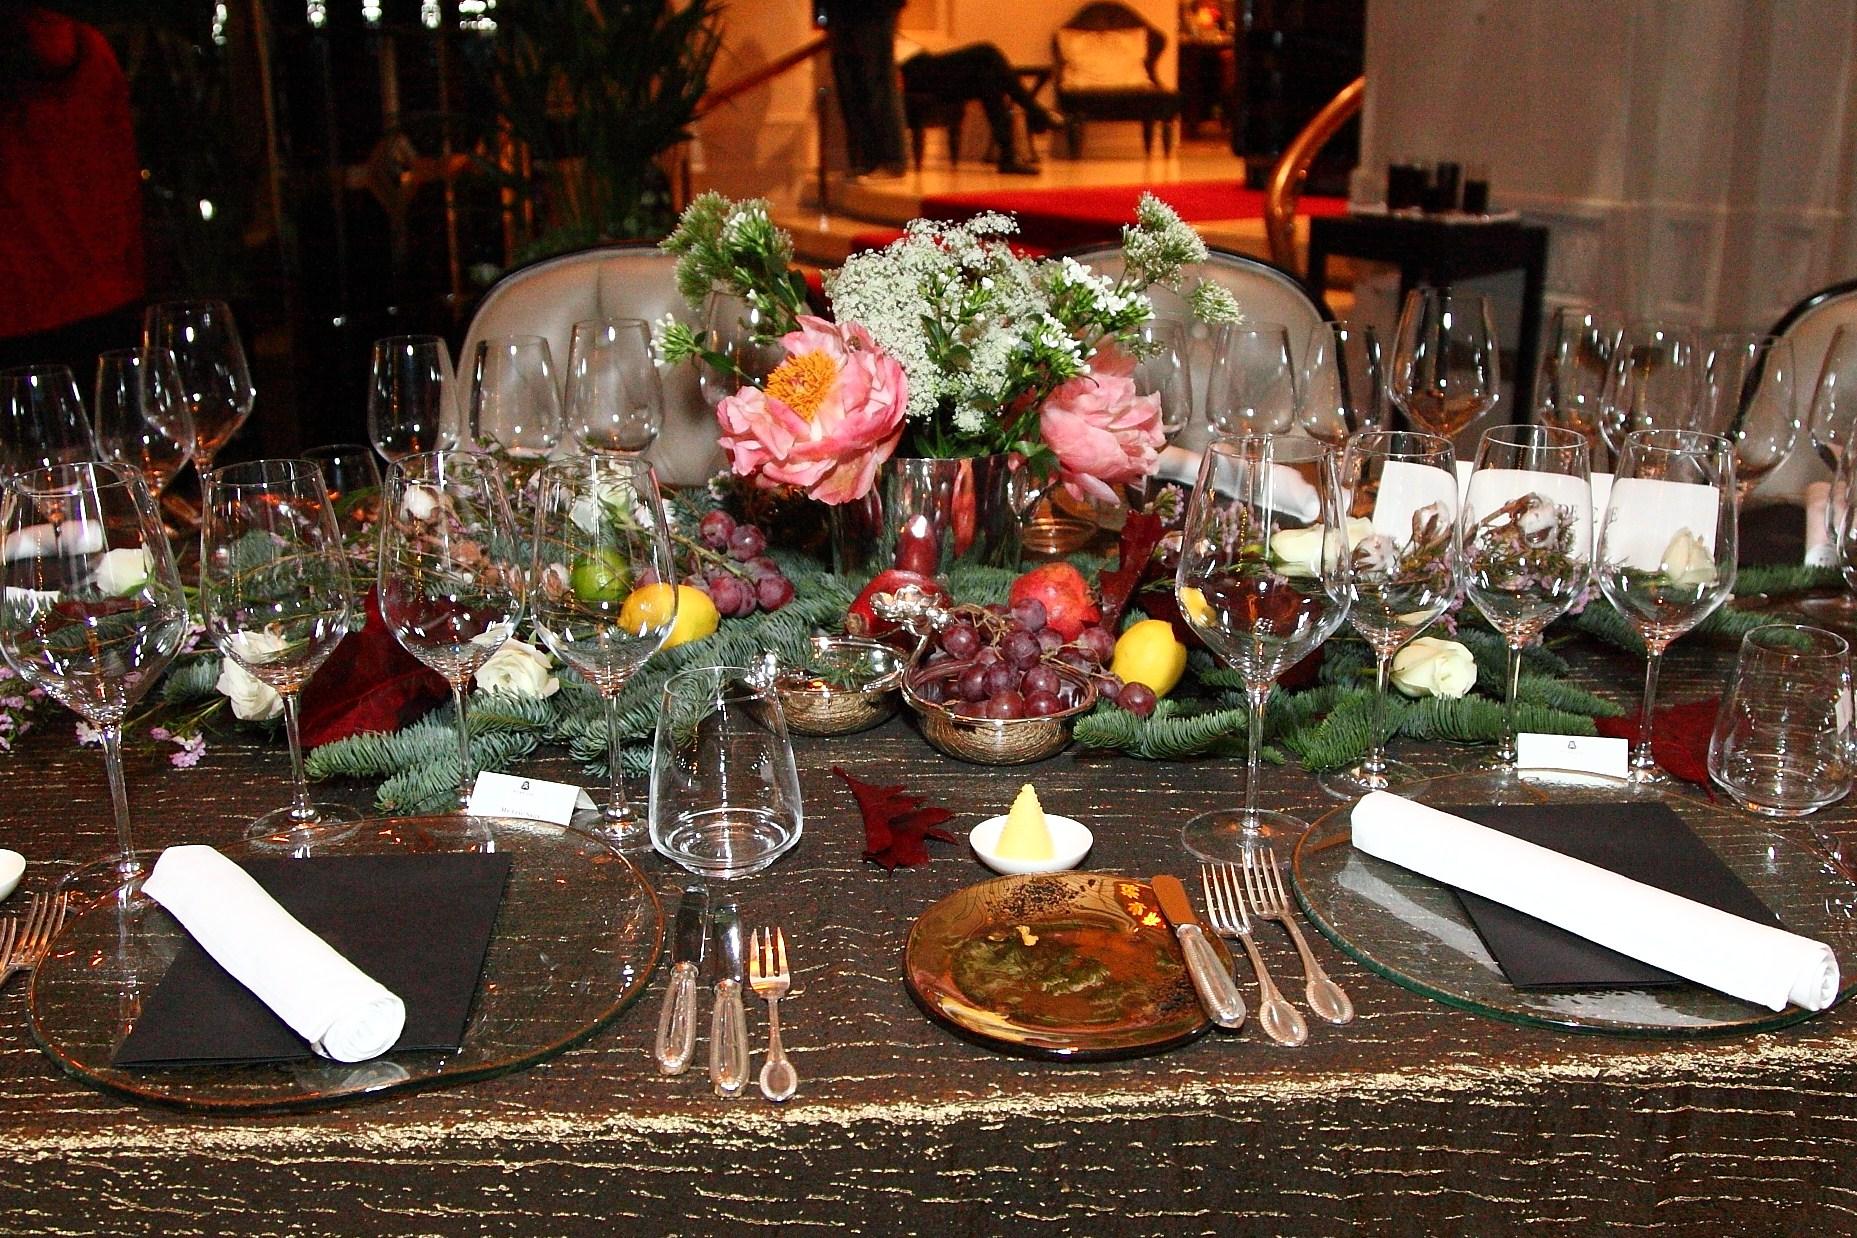 Societe Generale Gala Dinner